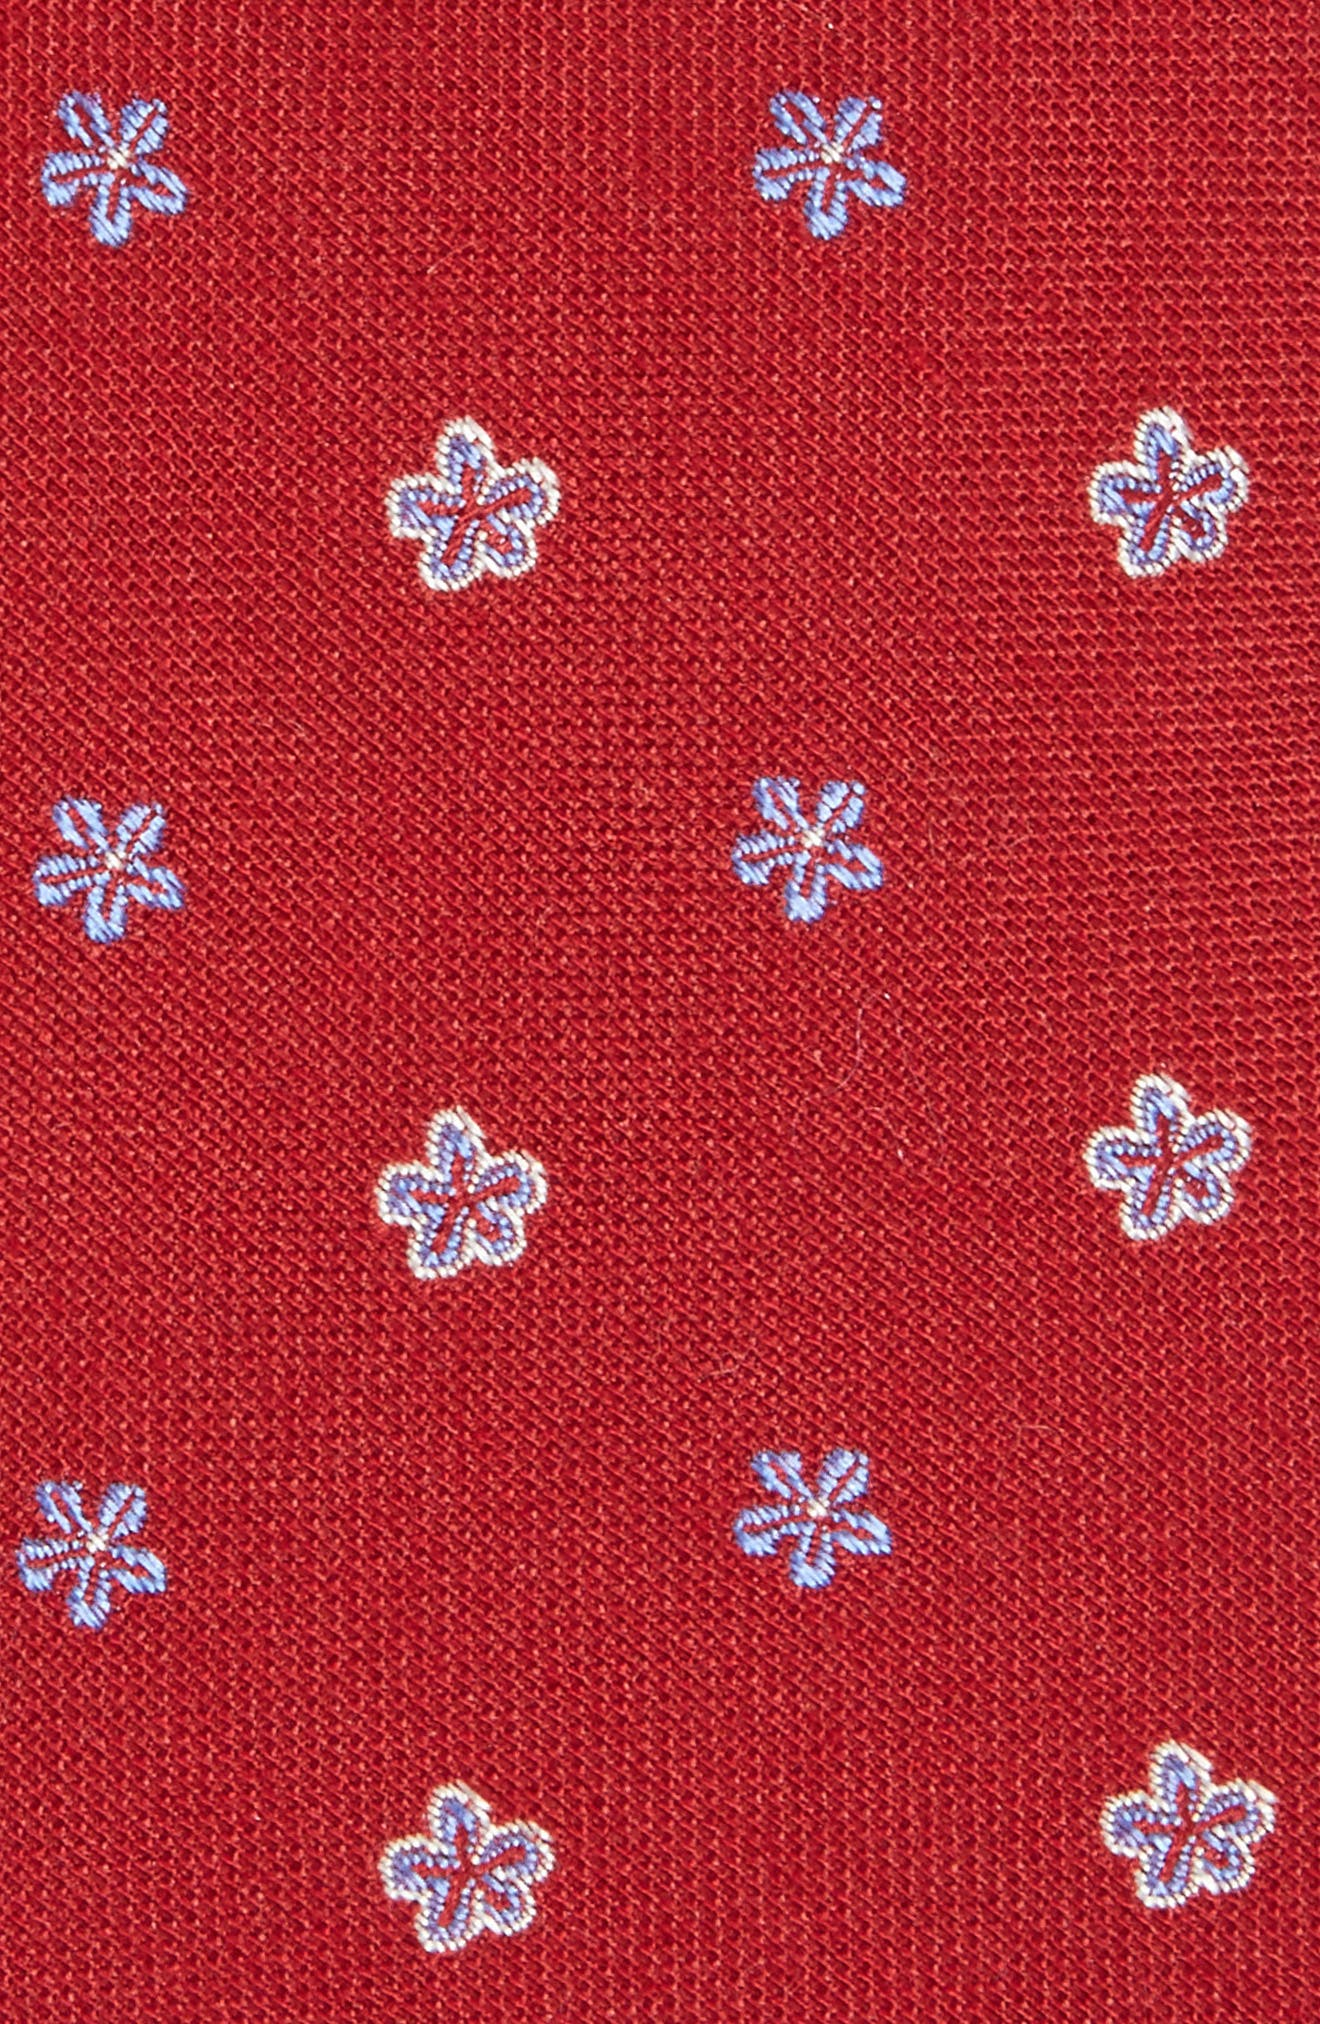 Essex Floral Silk Blend Tie,                             Alternate thumbnail 2, color,                             Burgundy